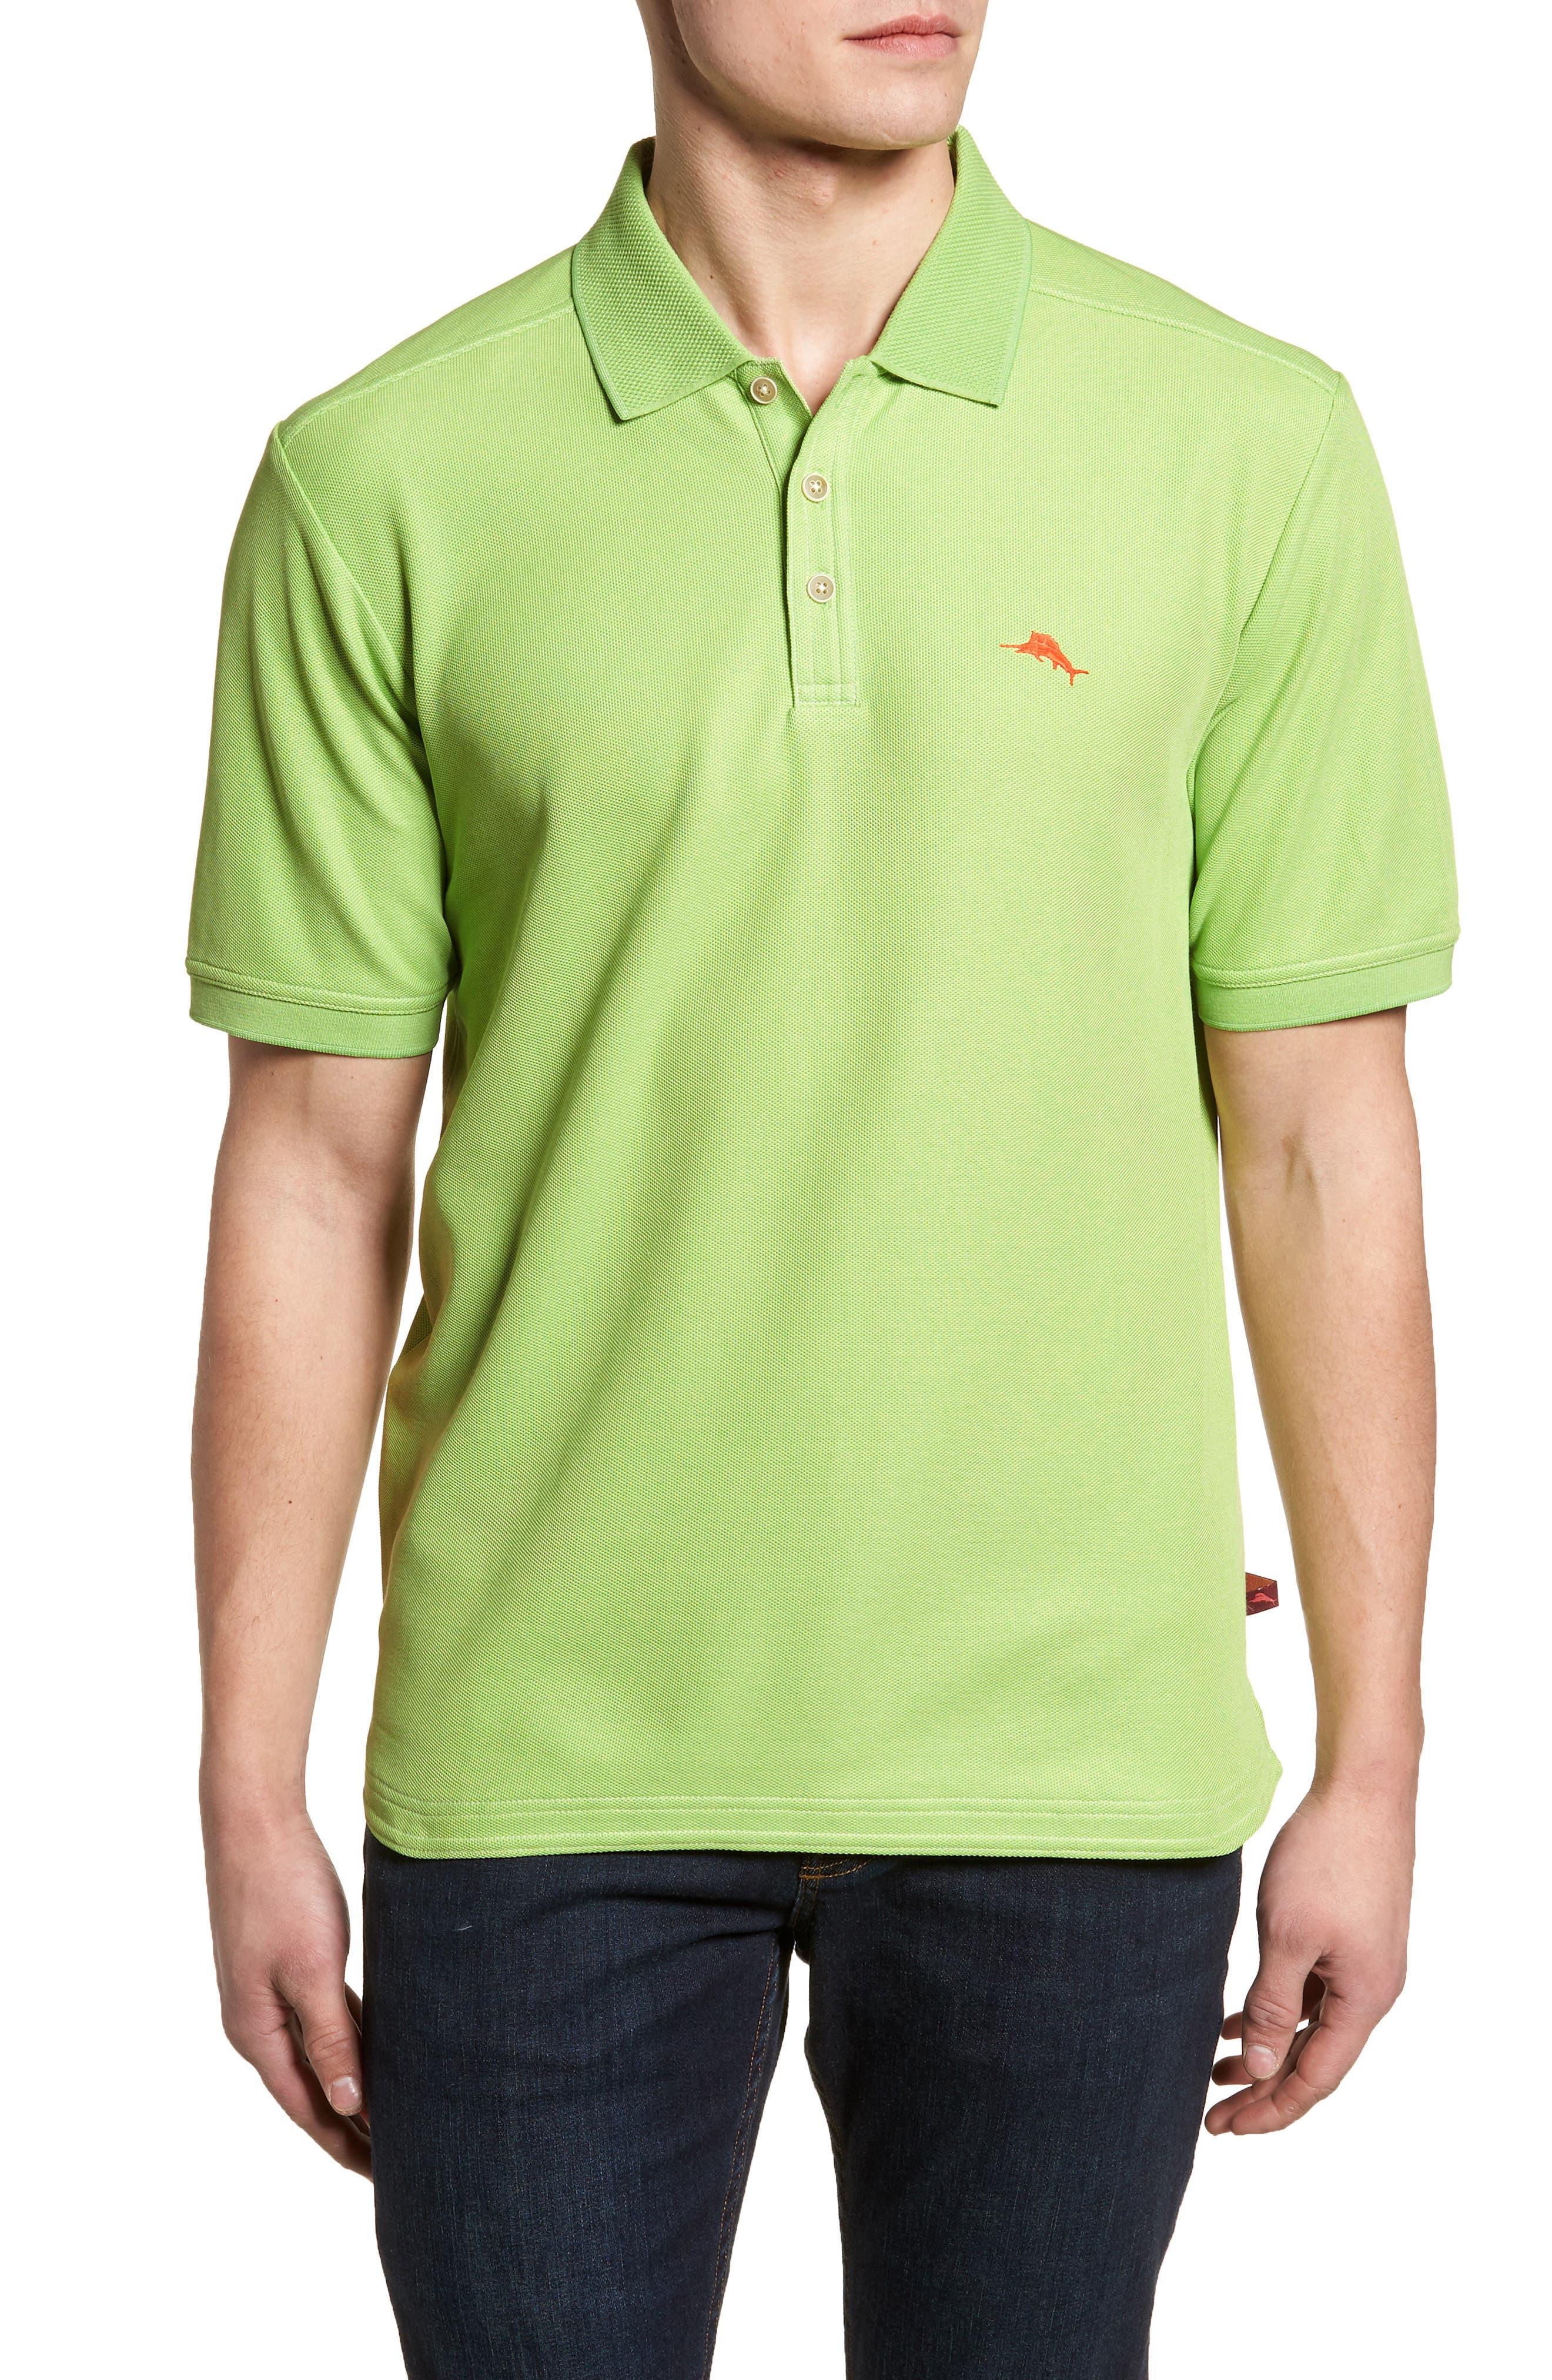 'The Emfielder' Original Fit Piqué Polo,                             Main thumbnail 1, color,                             Caicos Green